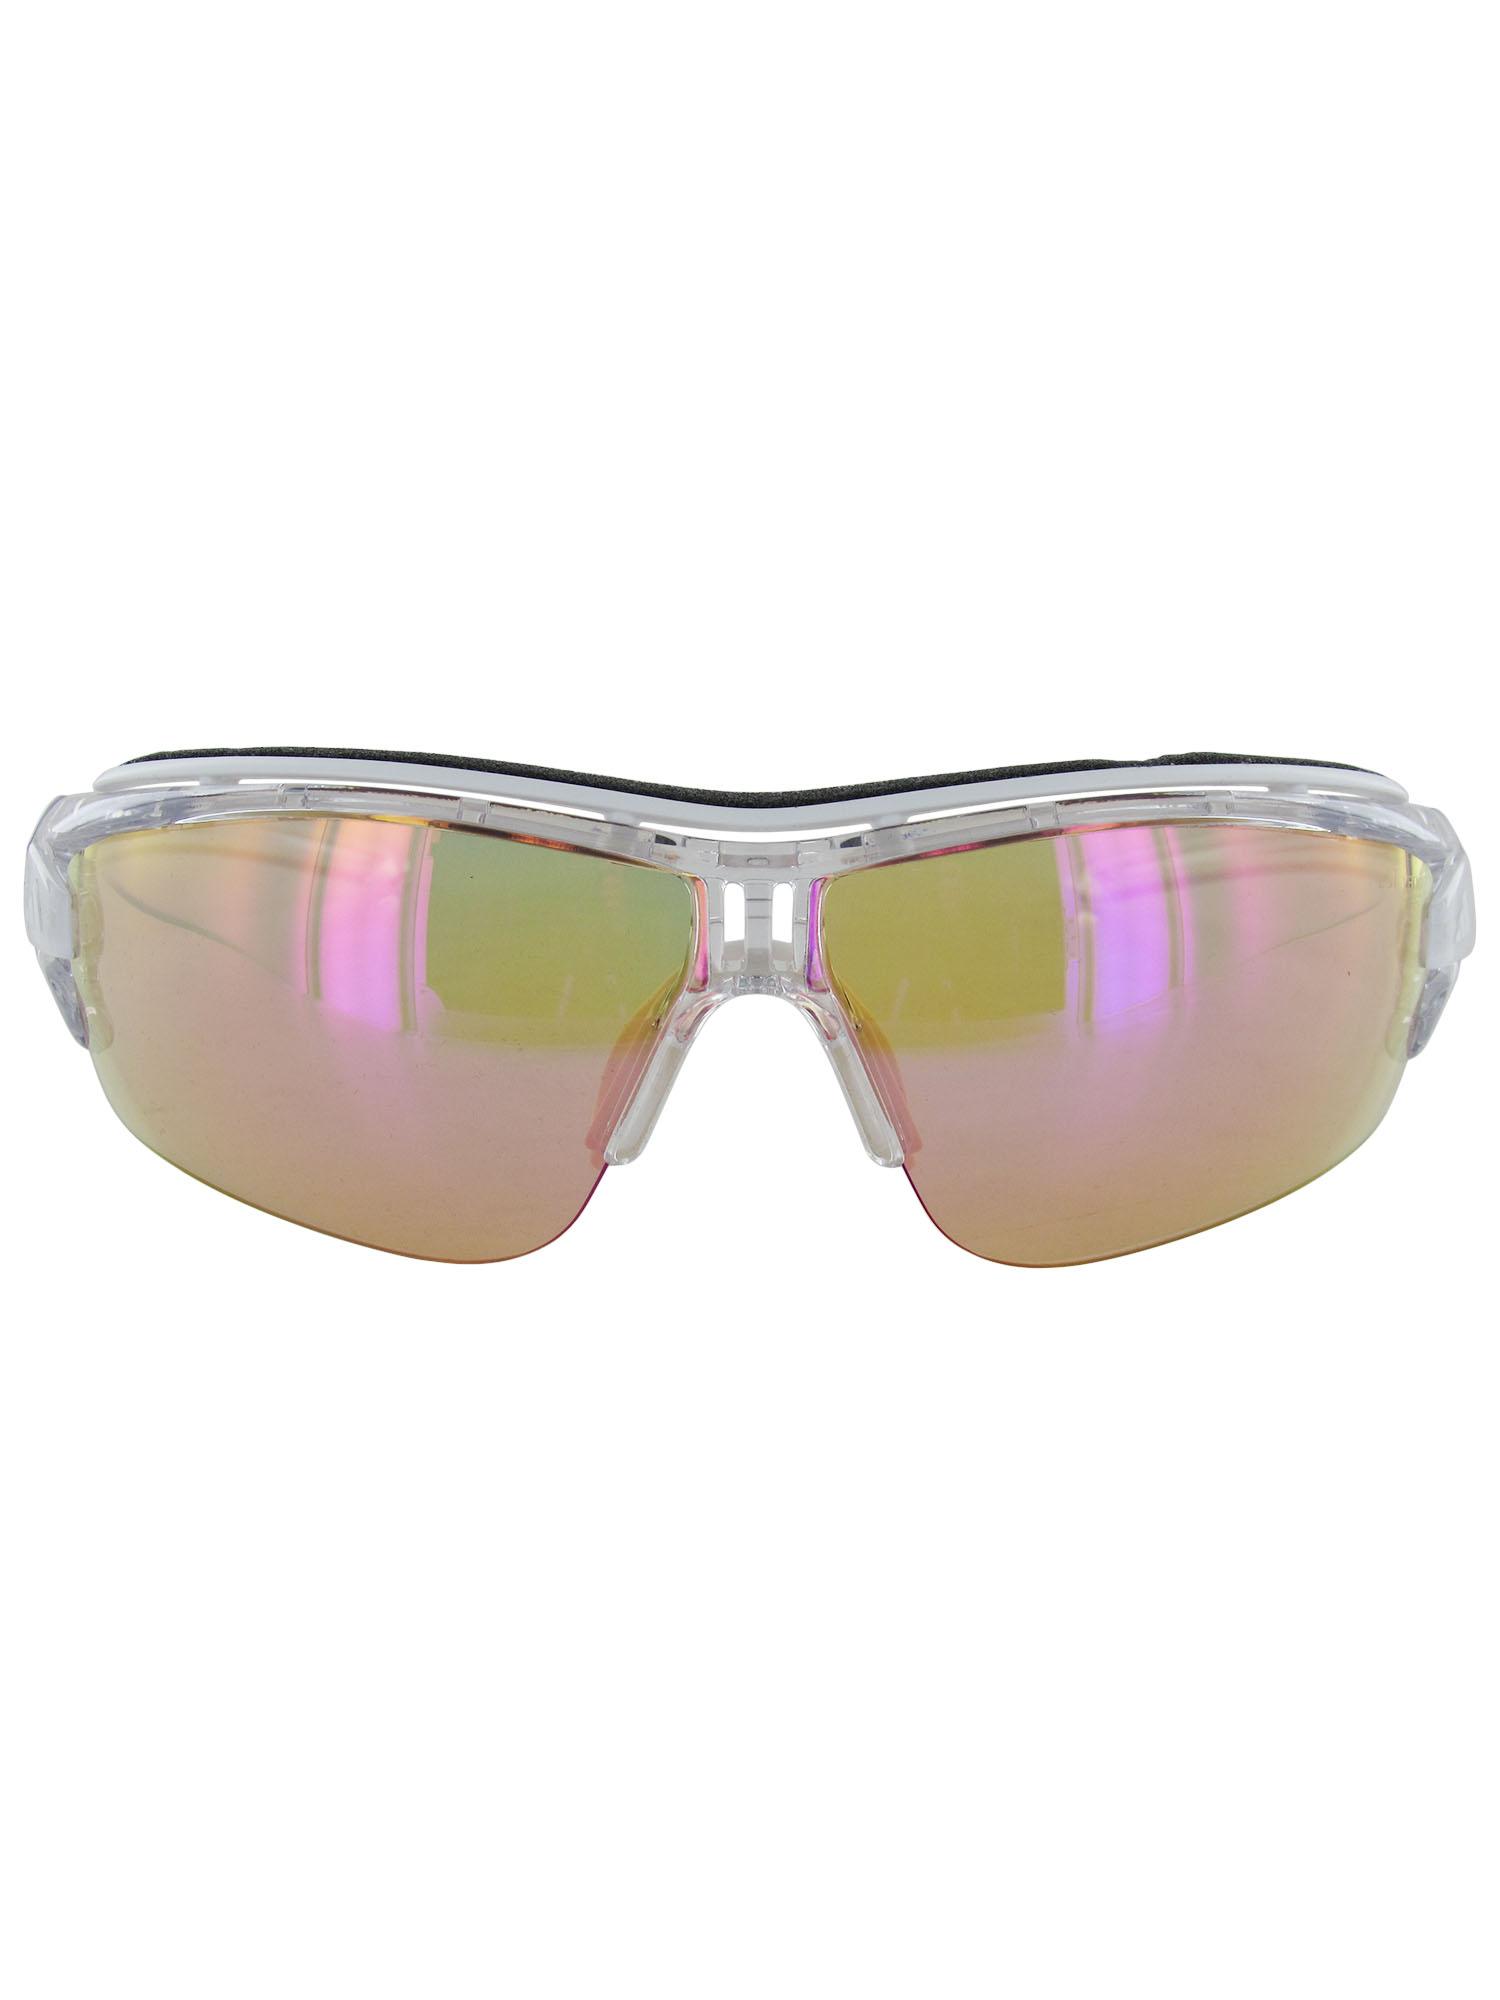 Sunglasses Adidas evil eye halfr.pro L a 181 A 6097 transparent